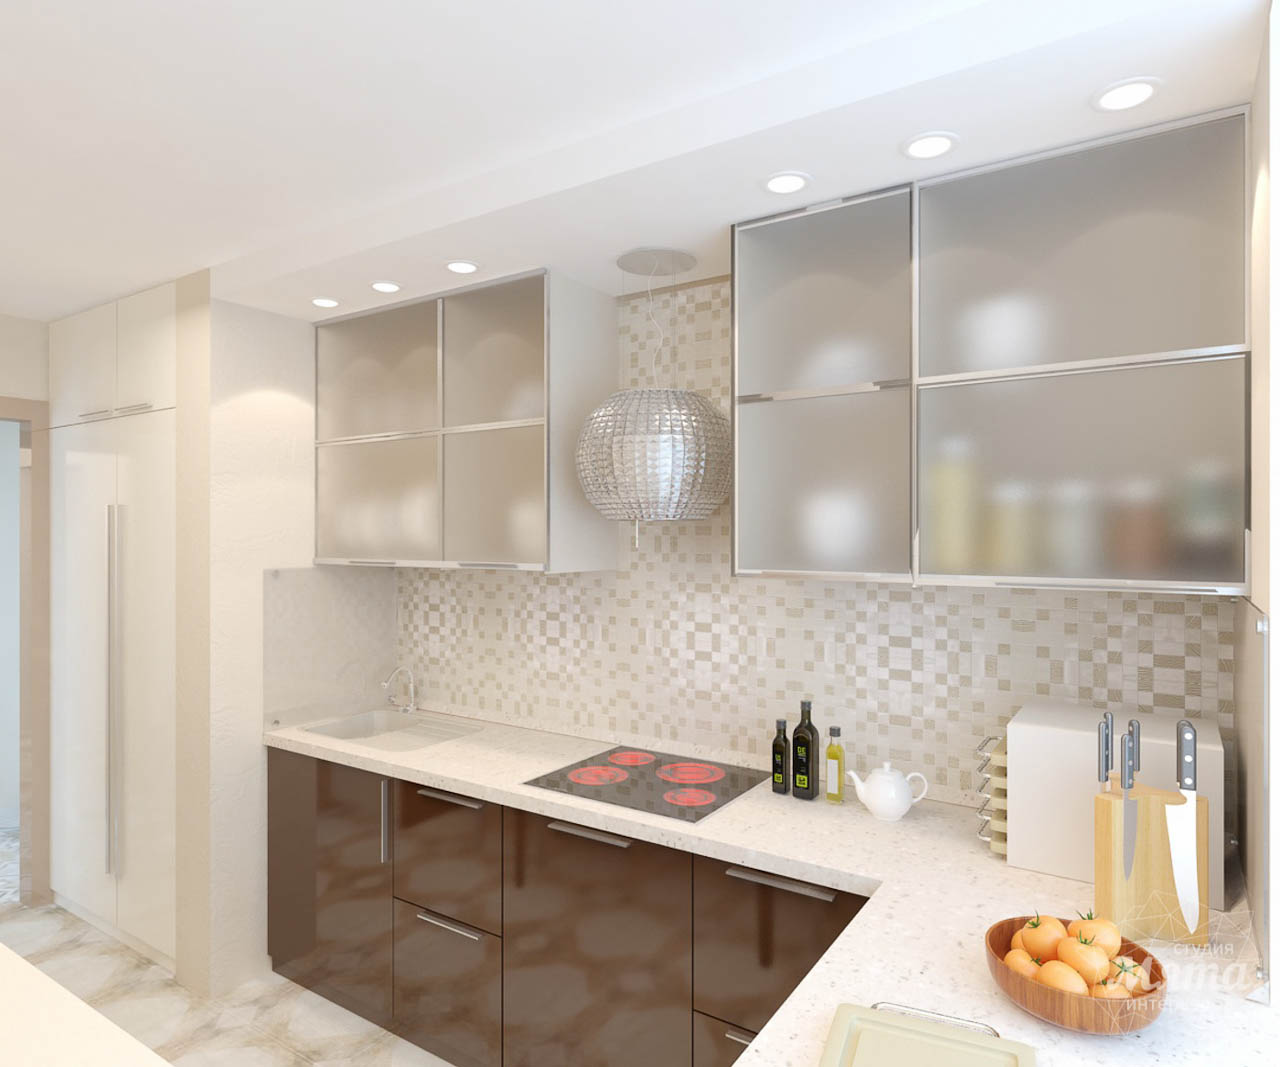 Дизайн интерьера и ремонт однокомнатной квартиры по ул. Бажова 134 img384418883